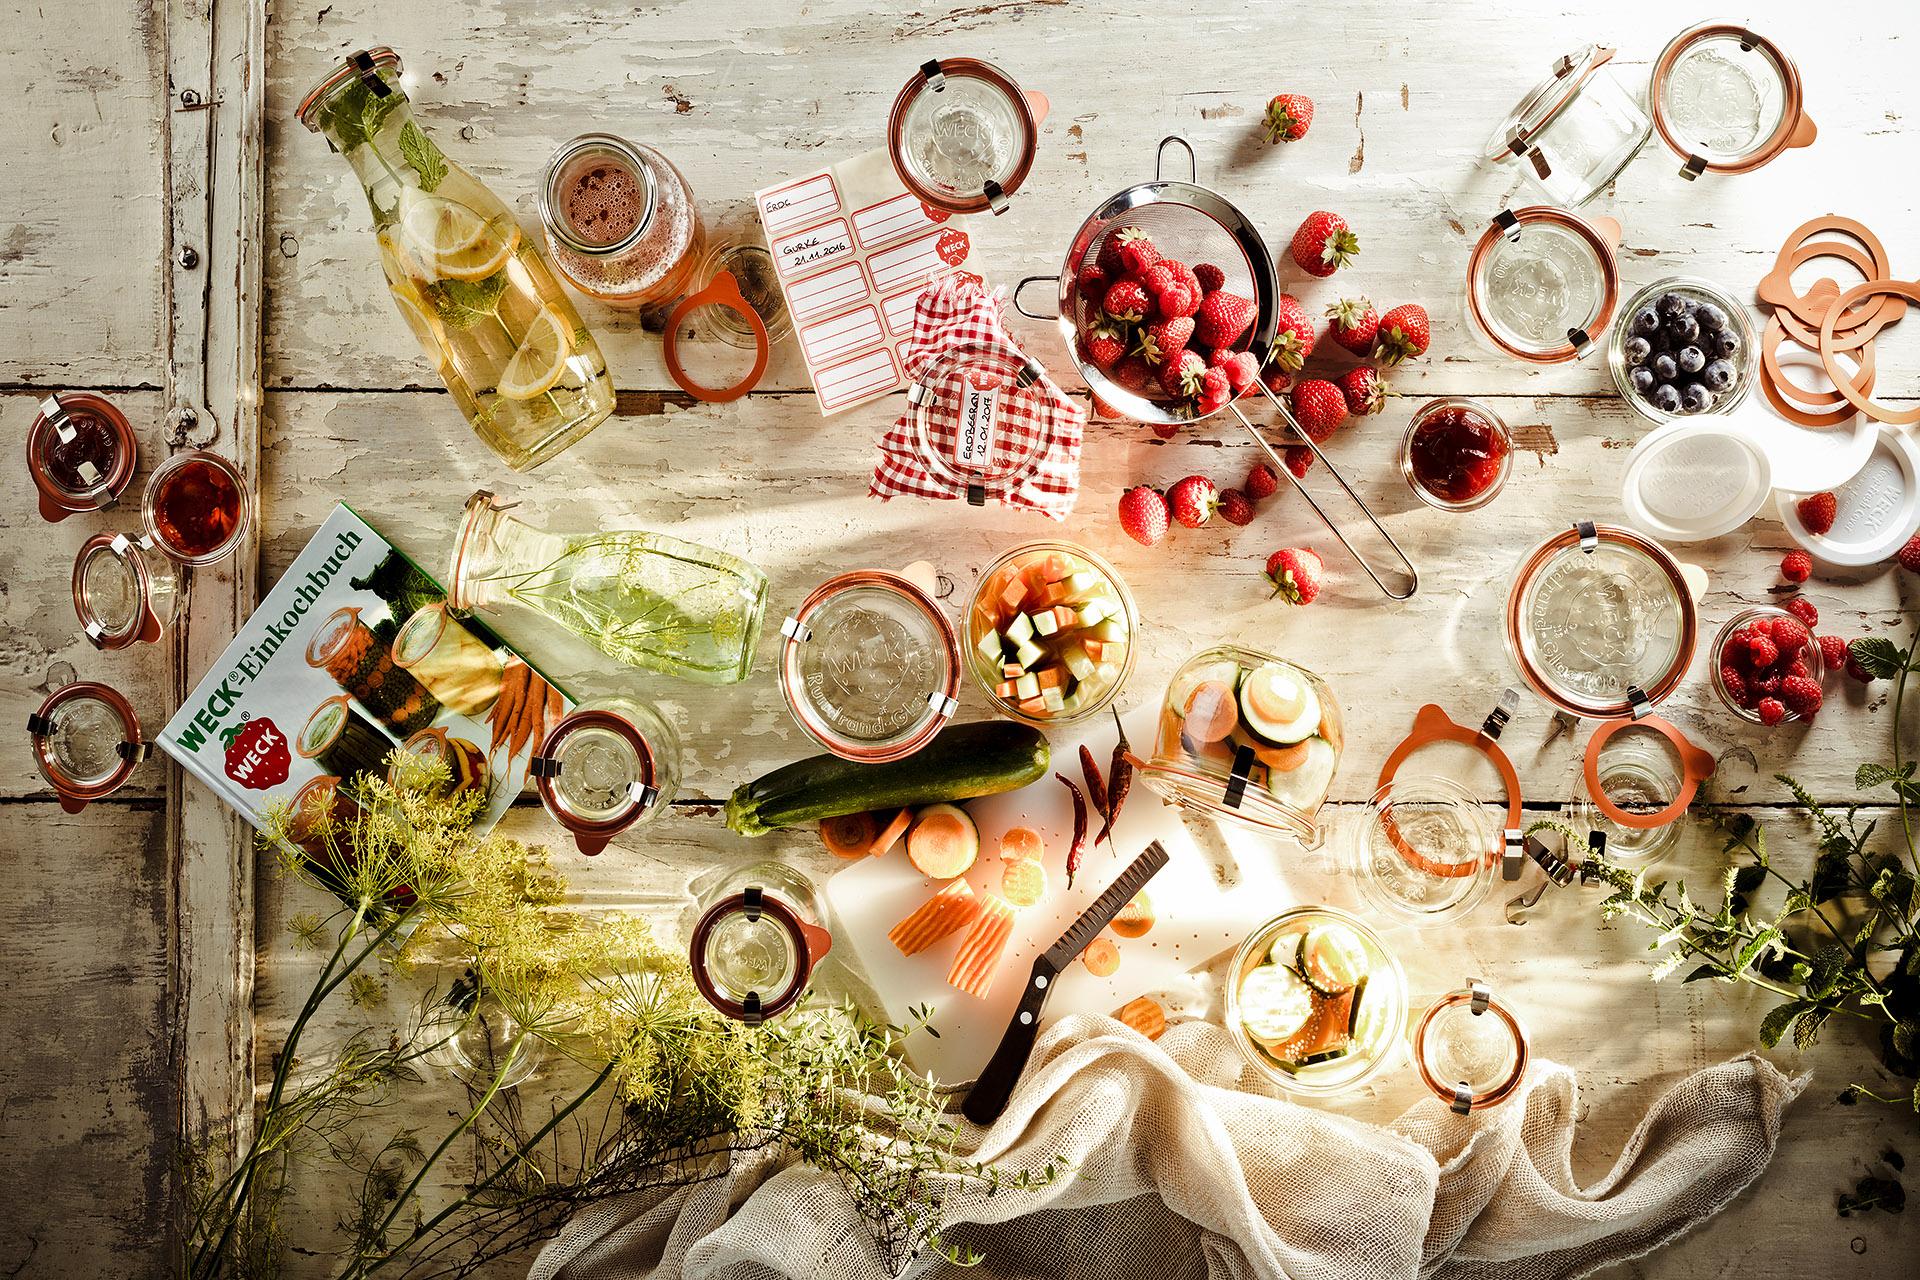 Lebensmittelfotografie vom Fotowerk Lampelmayer